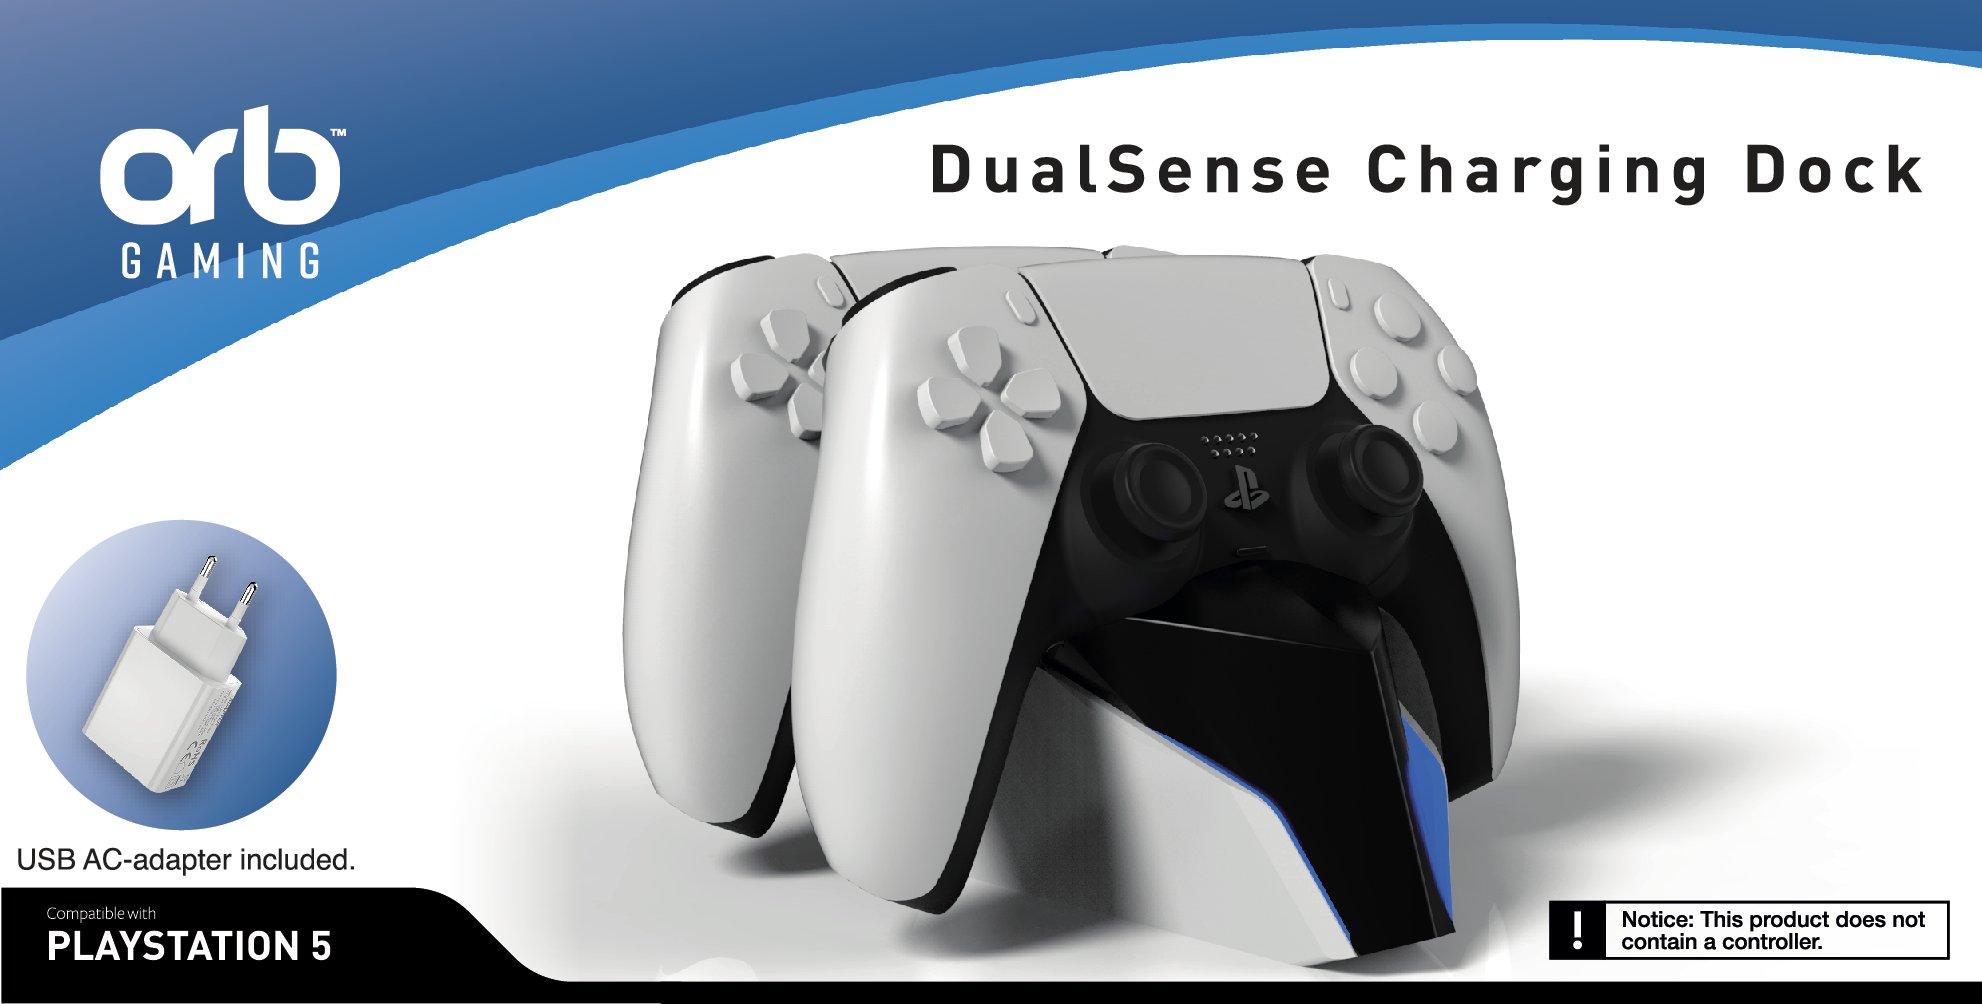 Playstation 5 DualSense Charging Dock